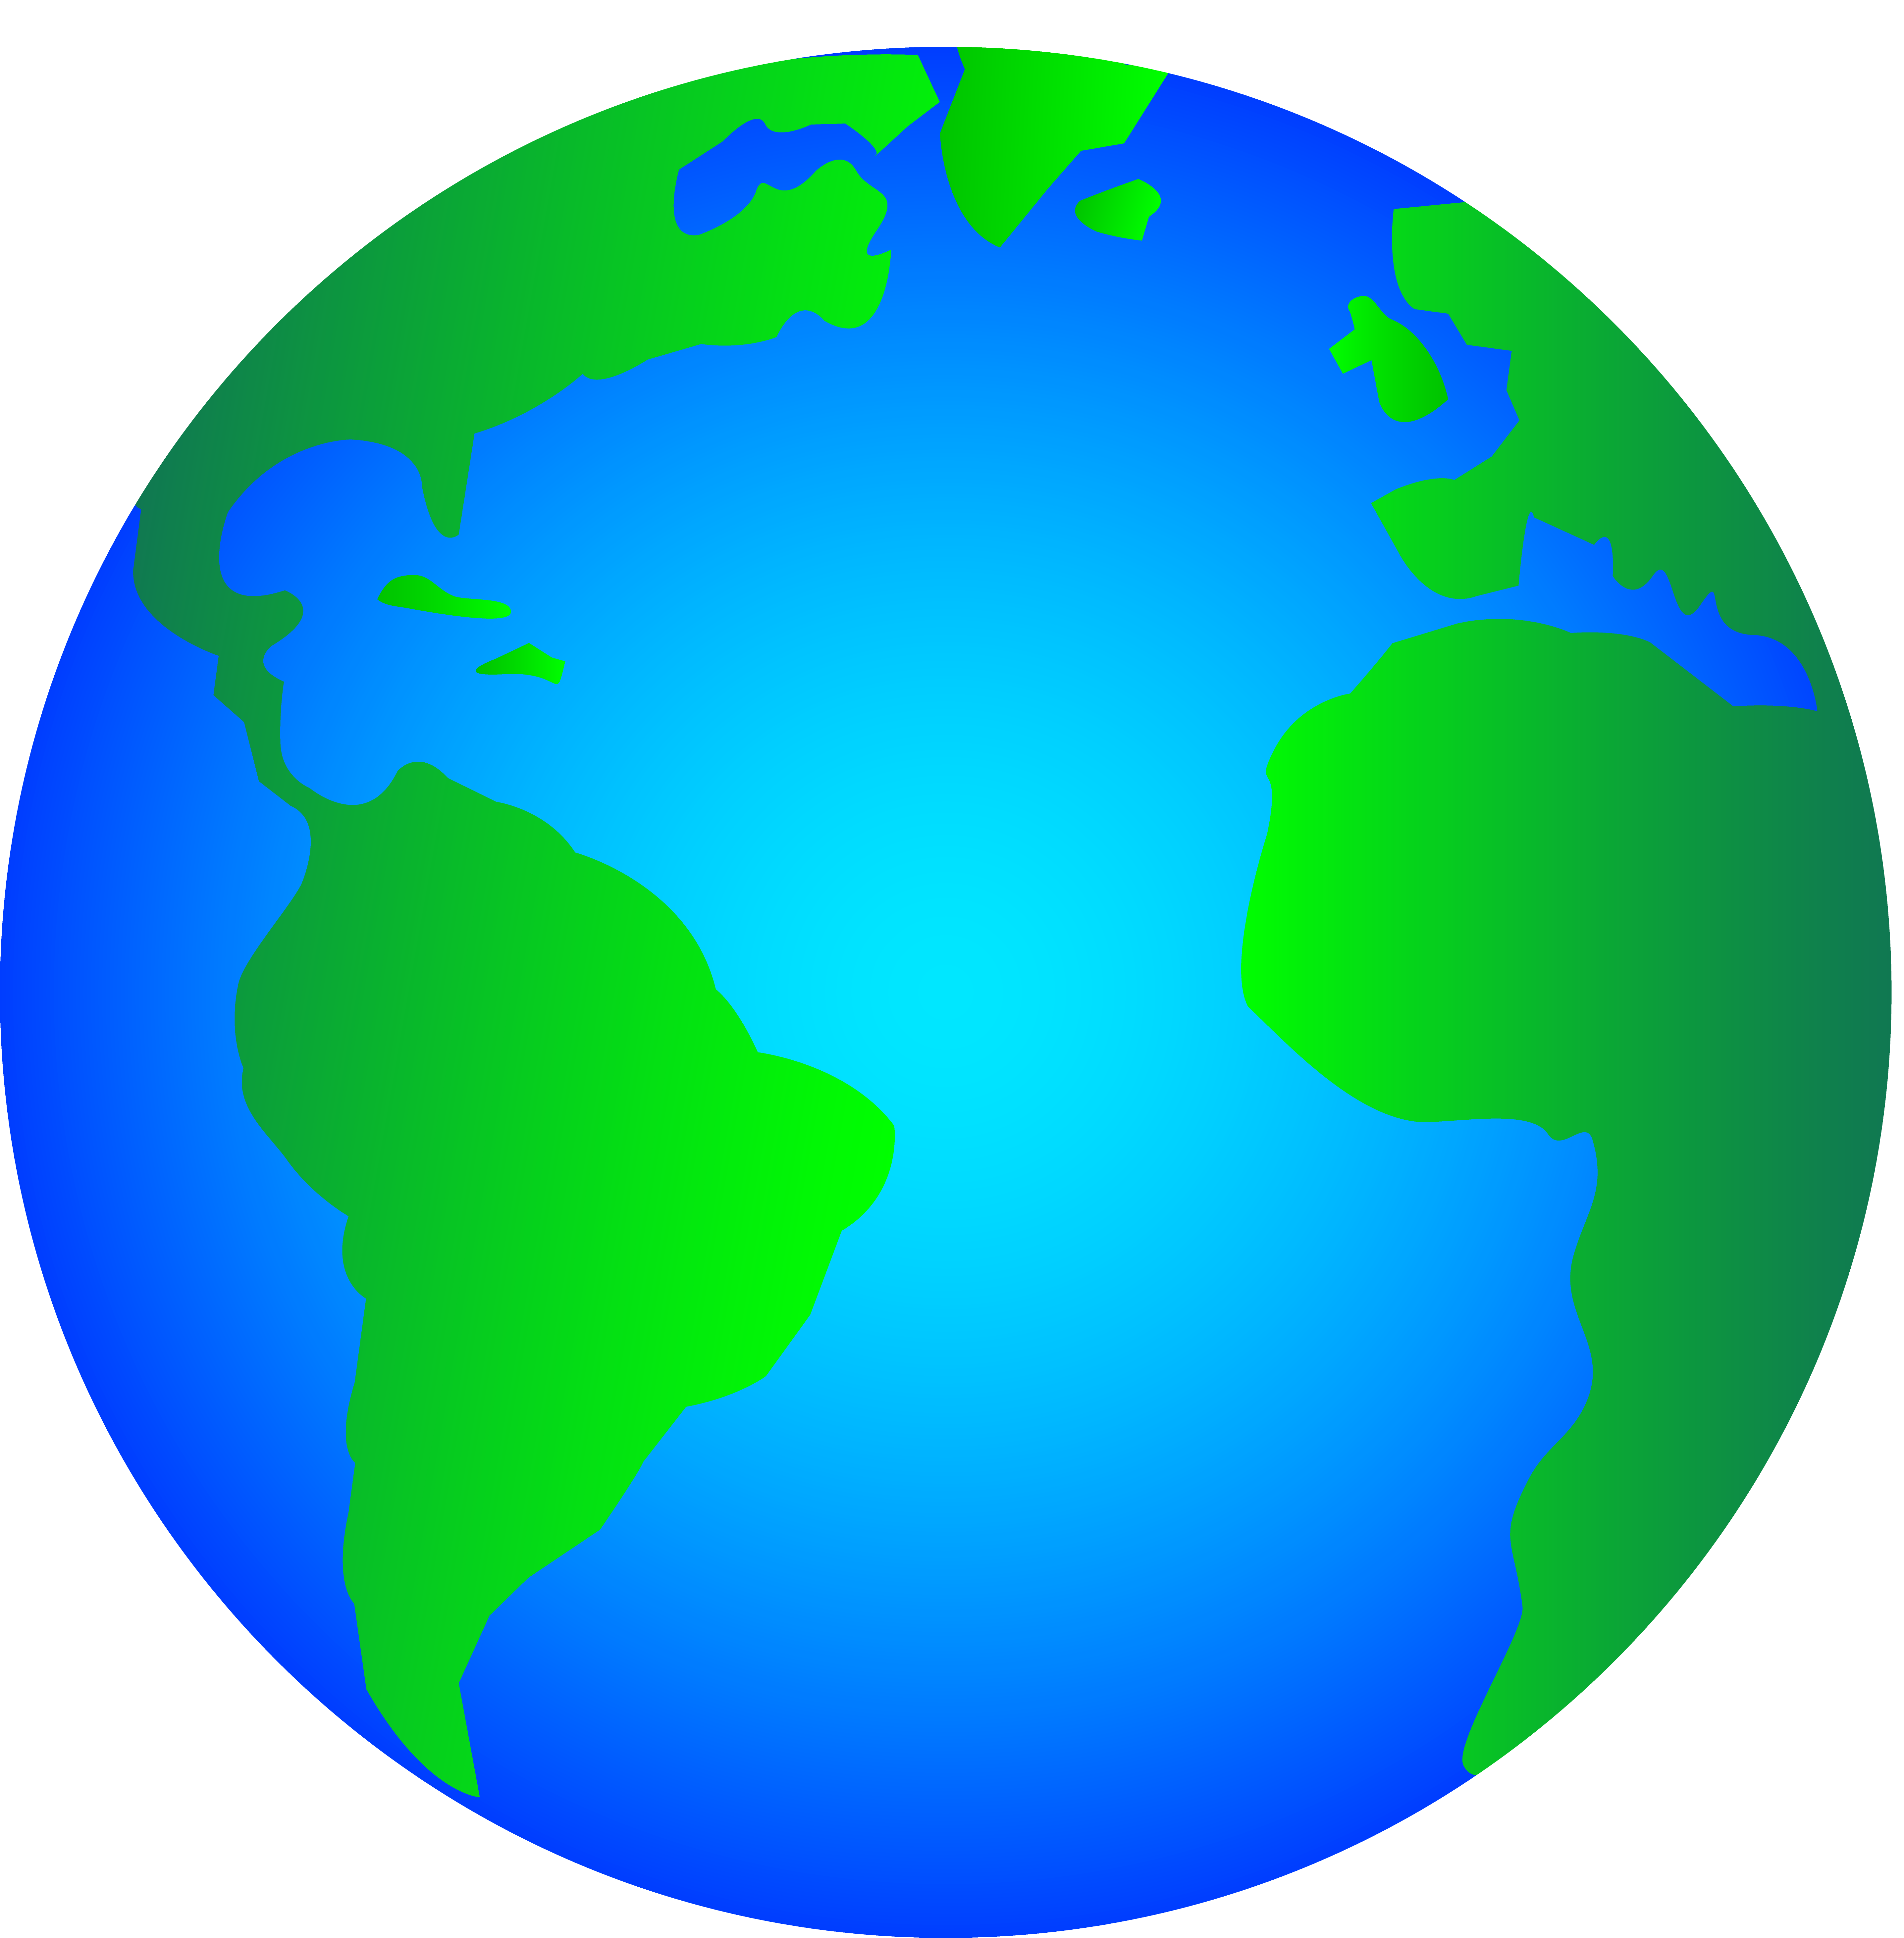 World globe map clipart jpg freeuse stock img.clipartall.com animated-globe-clip-art-globe-clipart-free ... jpg freeuse stock